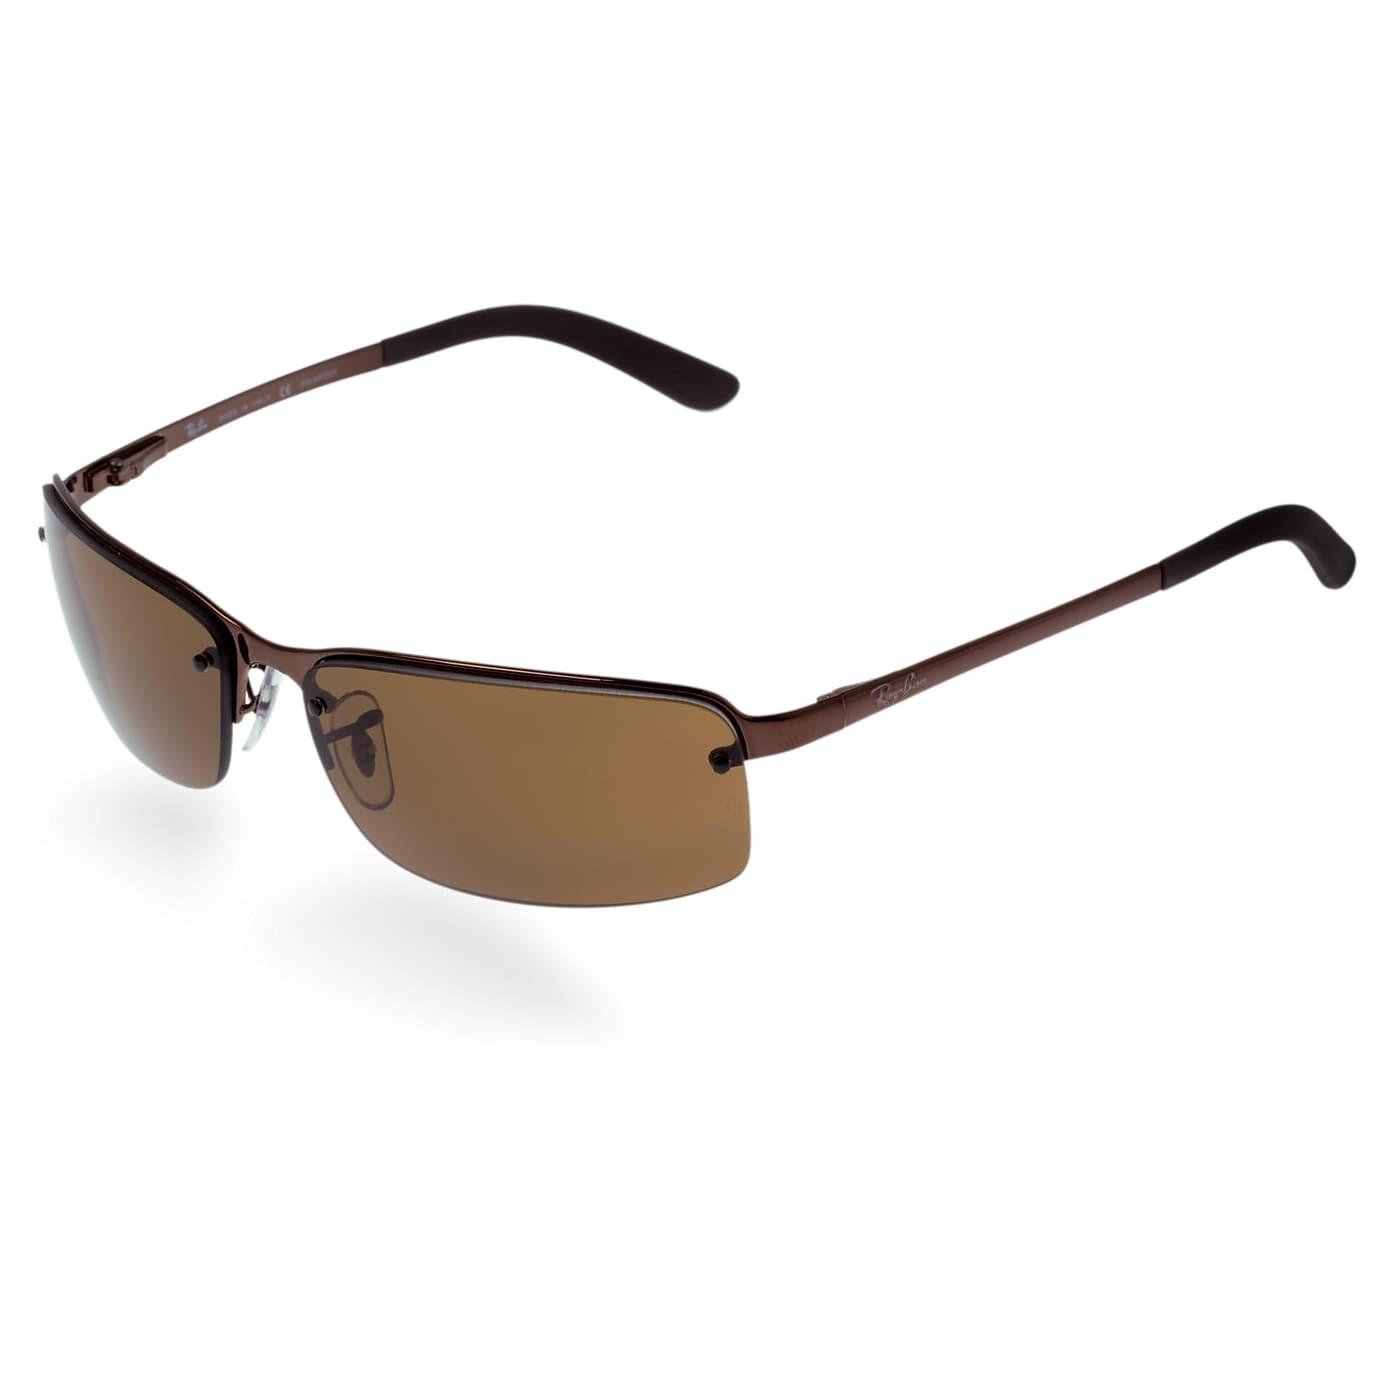 ed923b055f Ray ban Rb3217 Sunglasses 014 83 Brown (polarized Brown Lens) 62mm ...